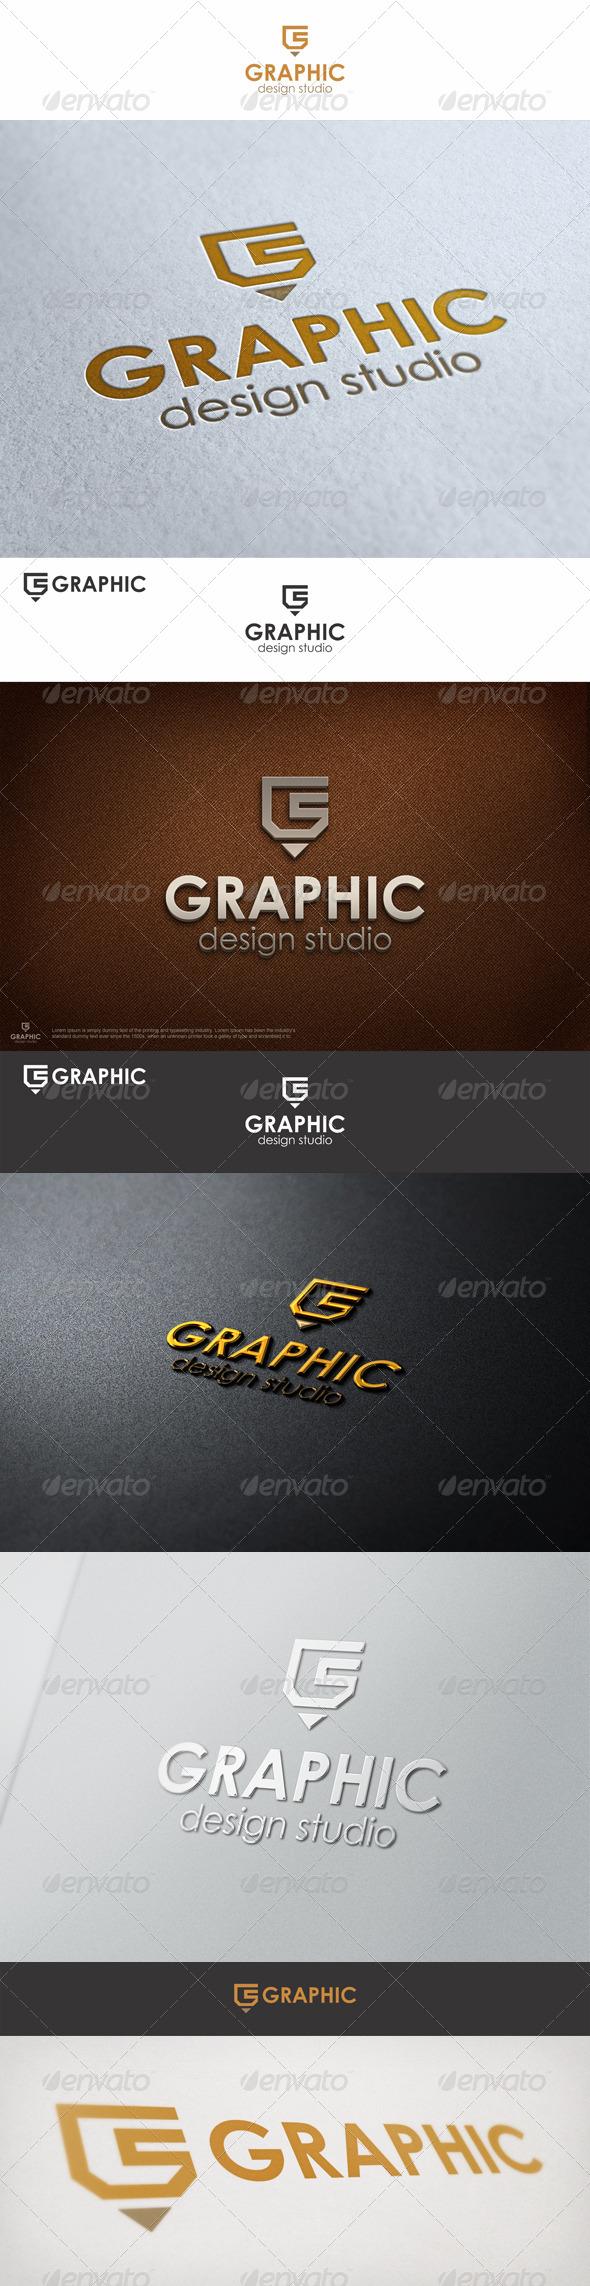 Graphic Pencil Studio Logo G